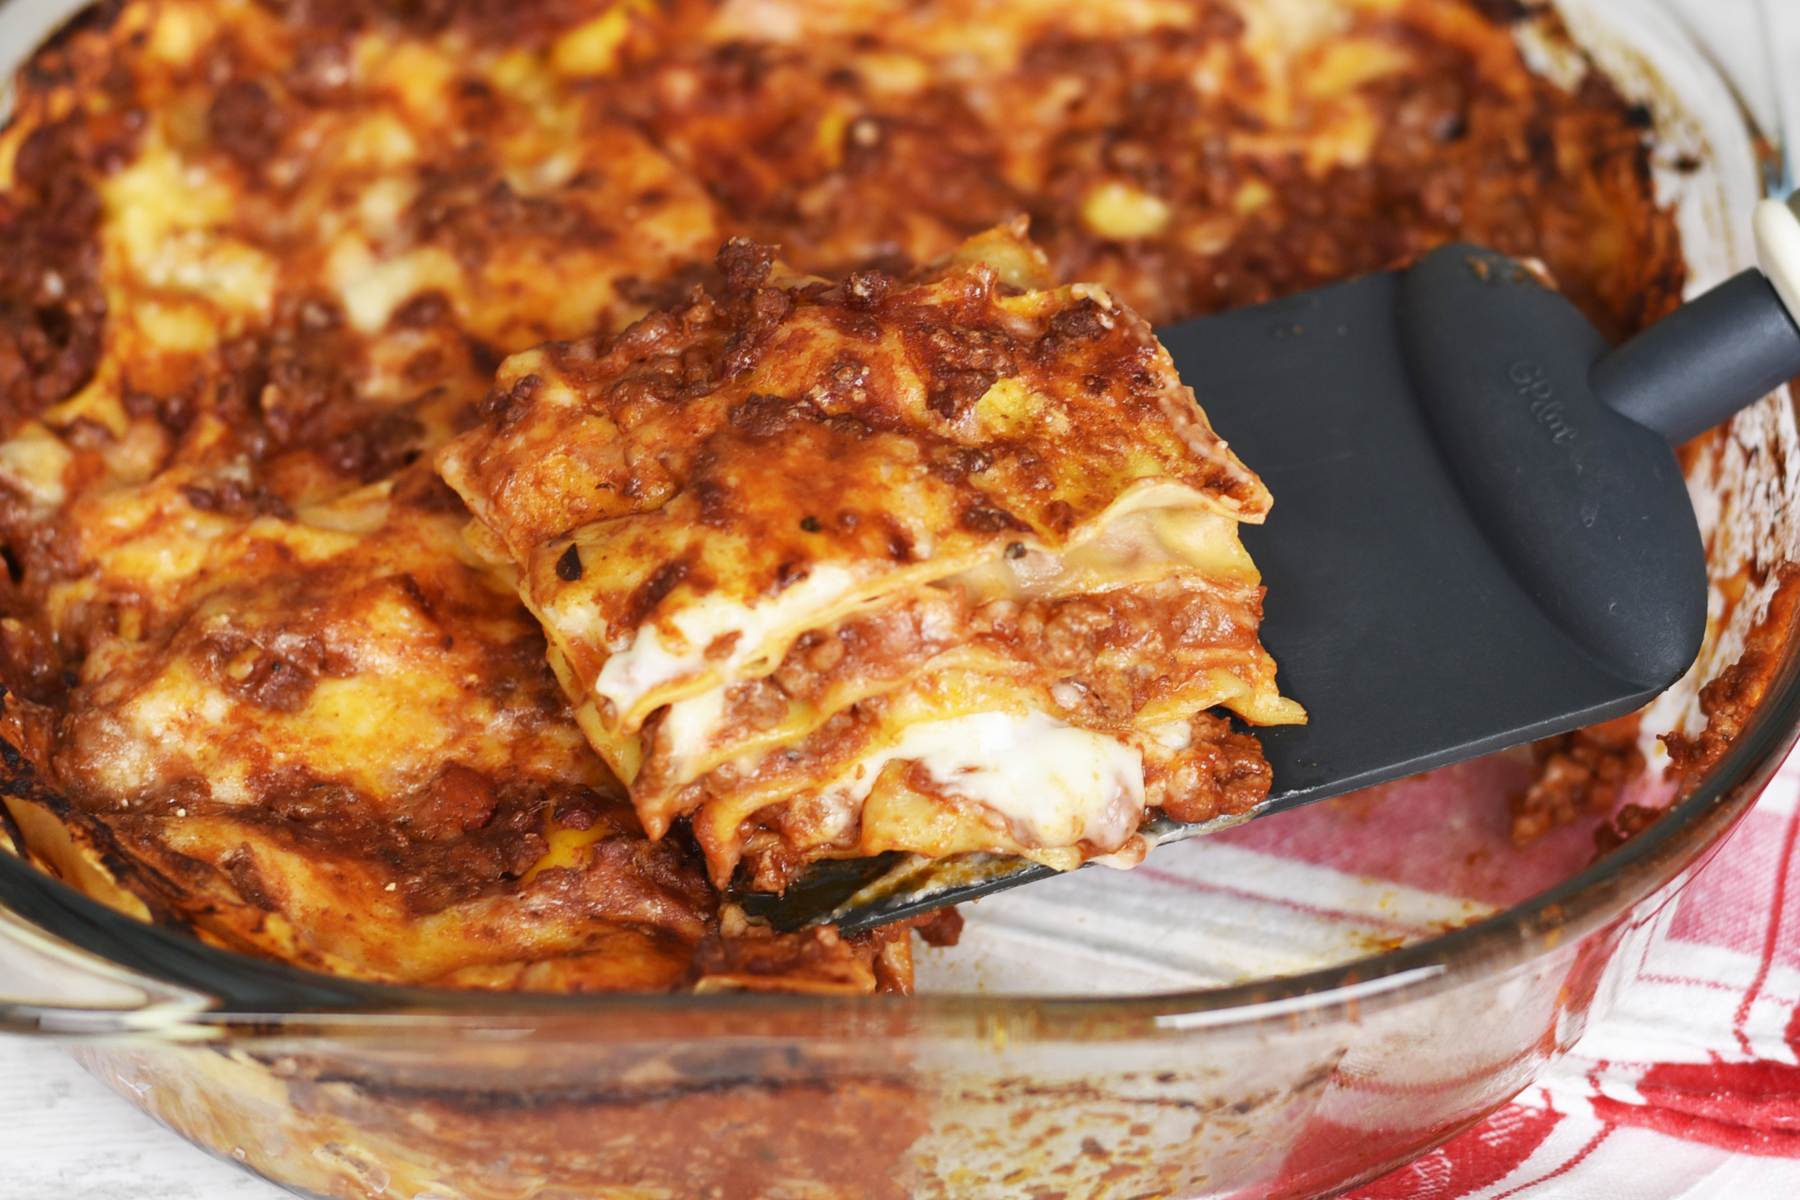 Ricetta Lasagne.The Recipe Of The Real Italian Lasagna Sempliceveloce Italian Food Blog